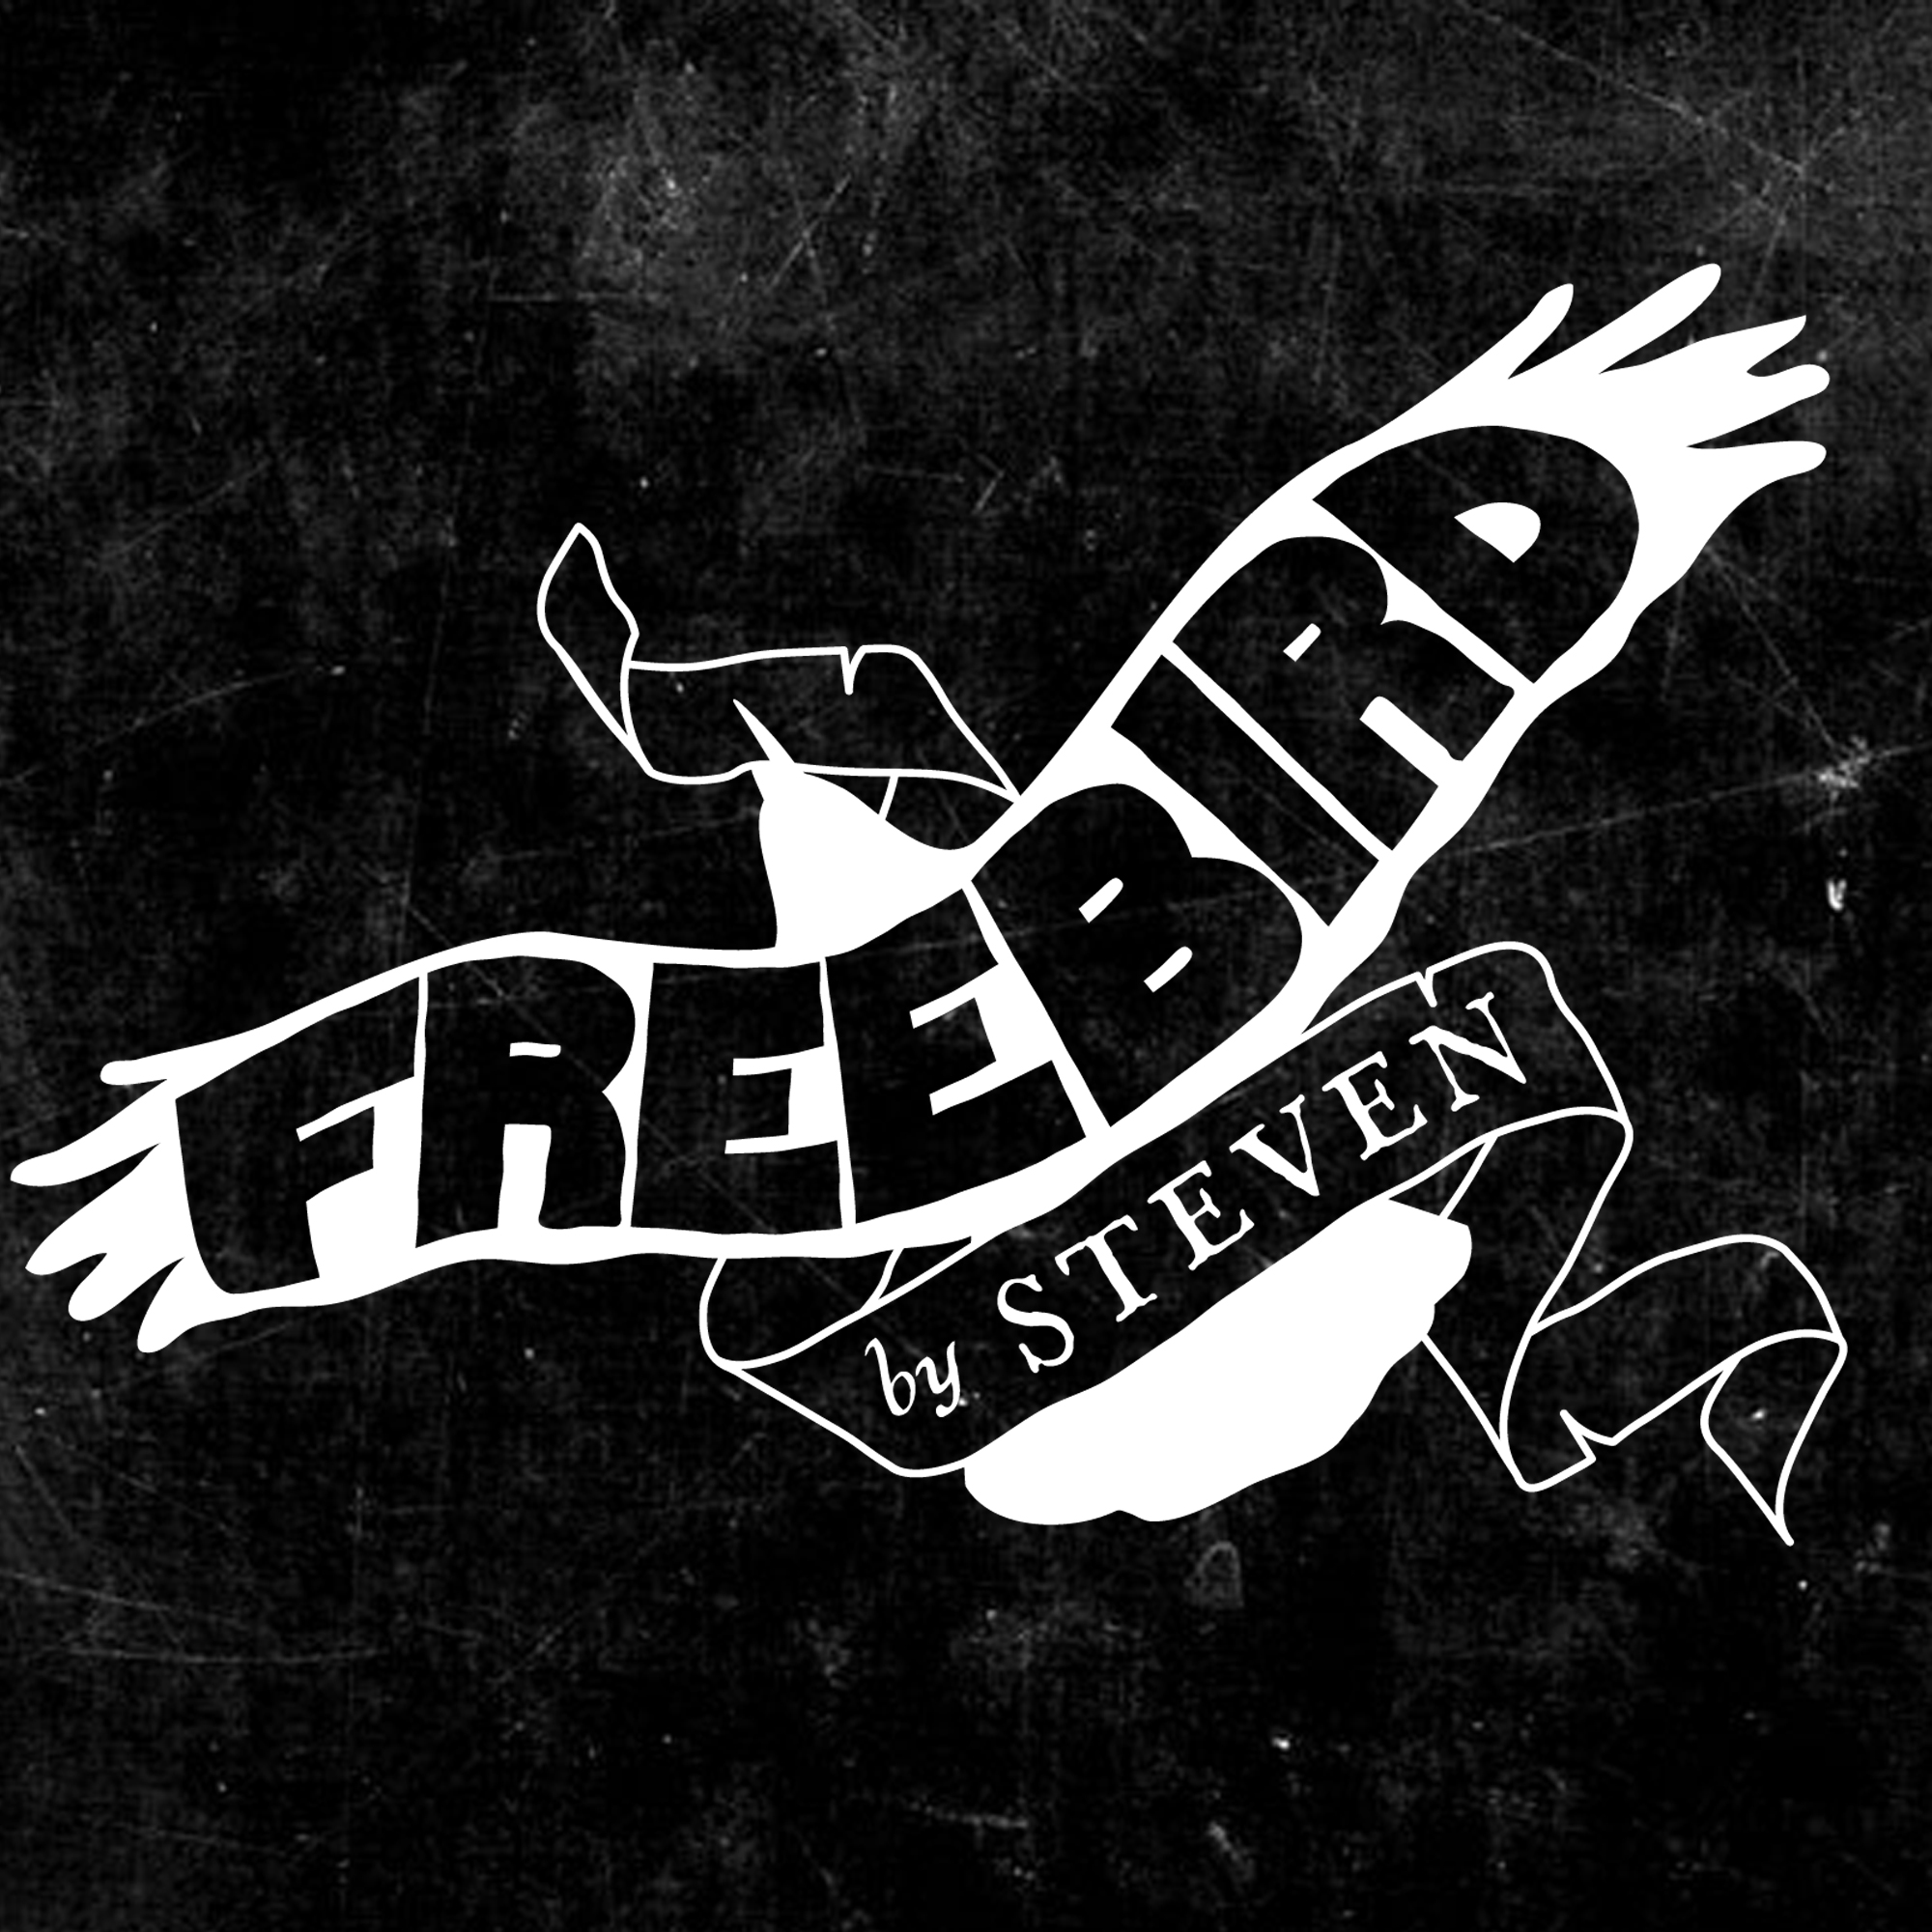 Freebird Stores image 5